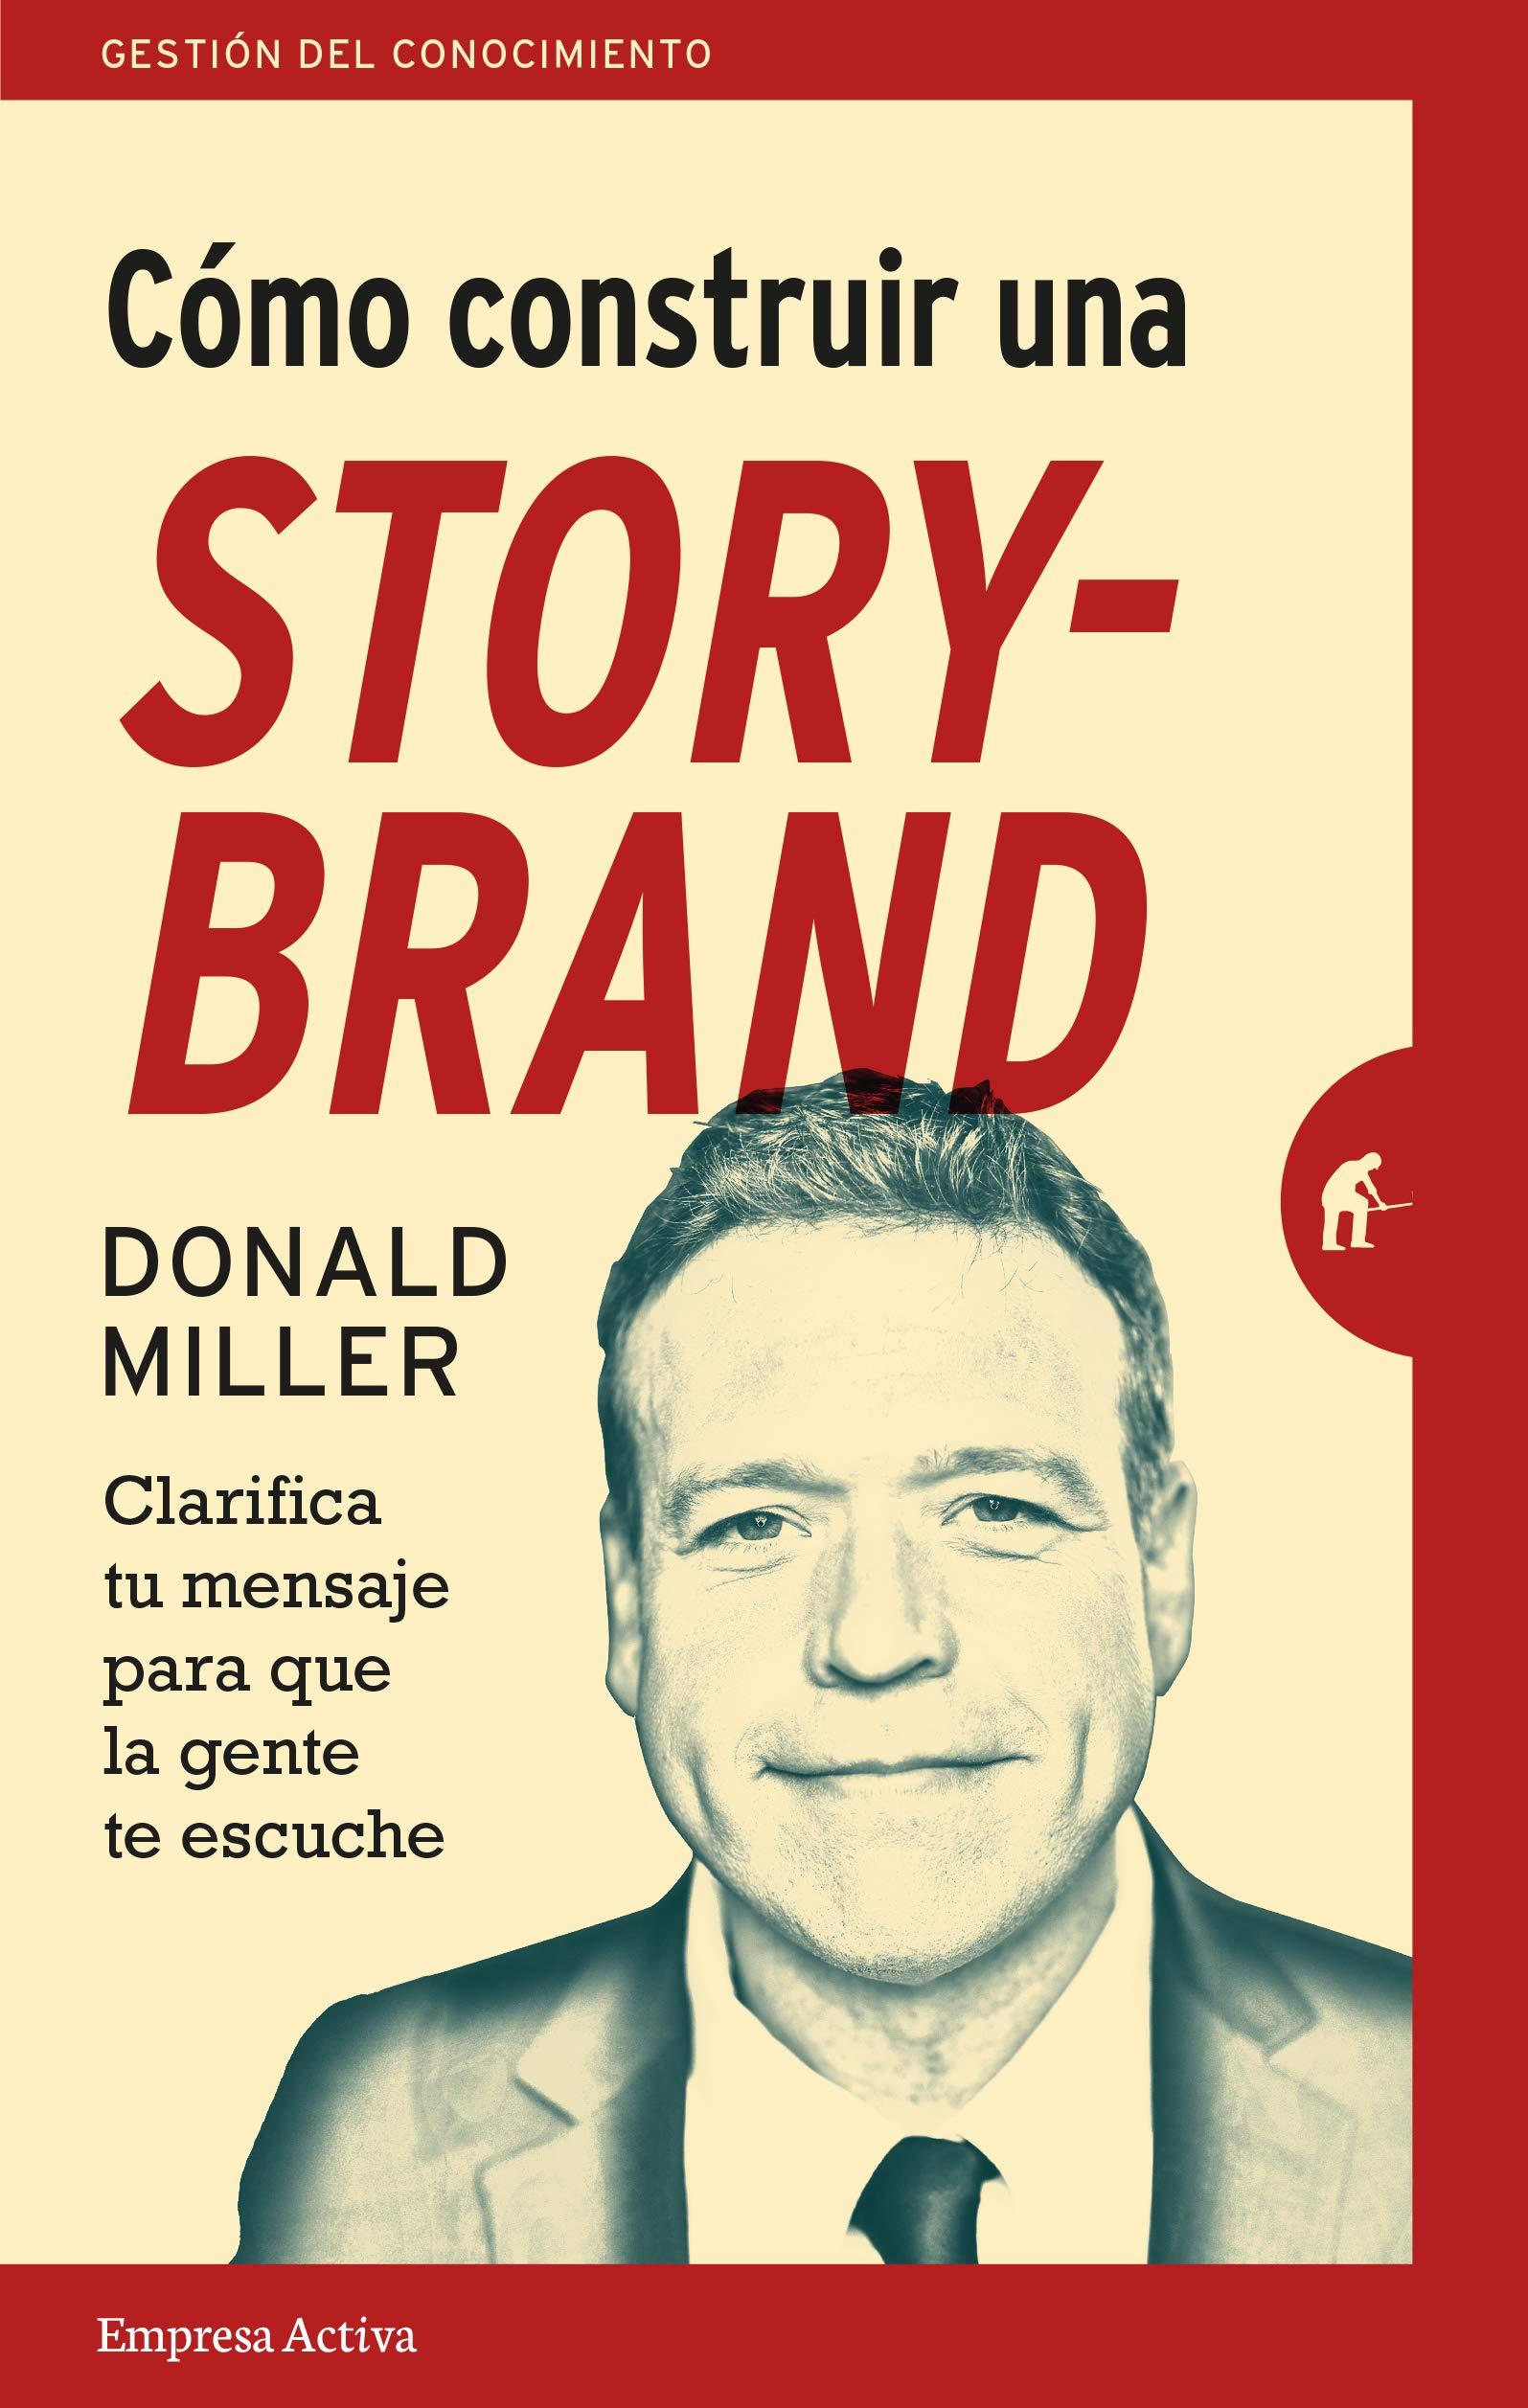 Como construir una storybrand de Donald Miller